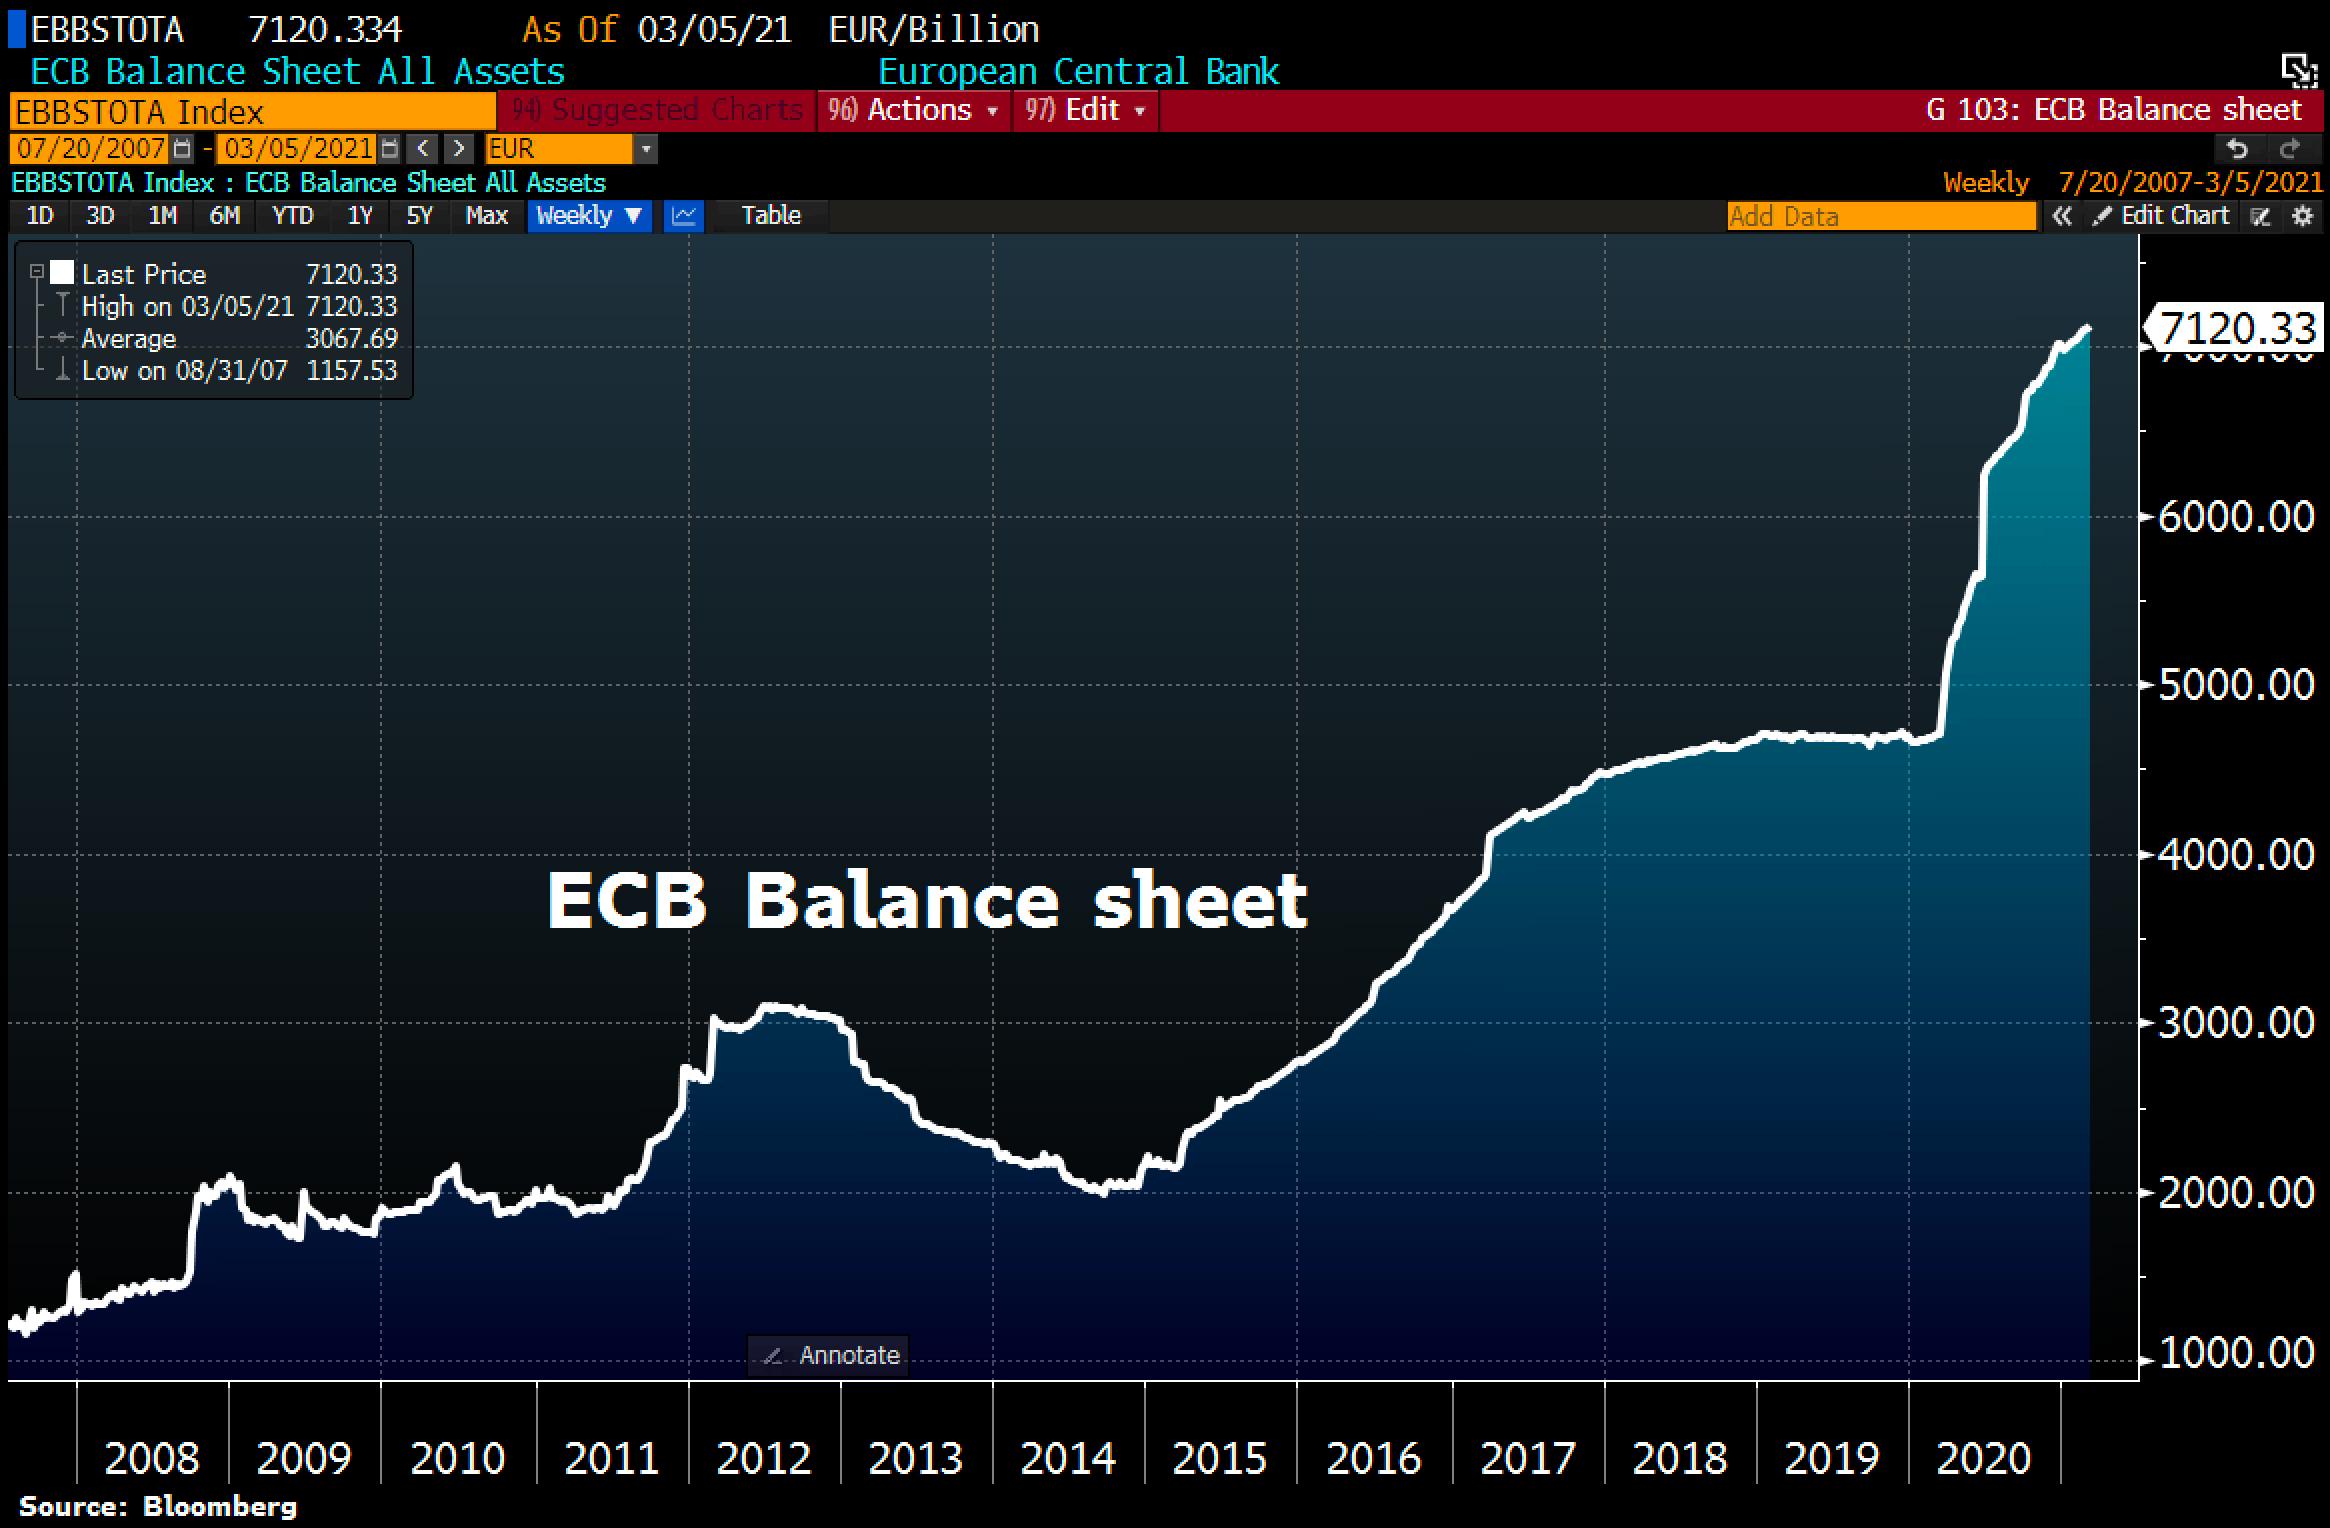 ECB balance sheet hitting a new all-time high